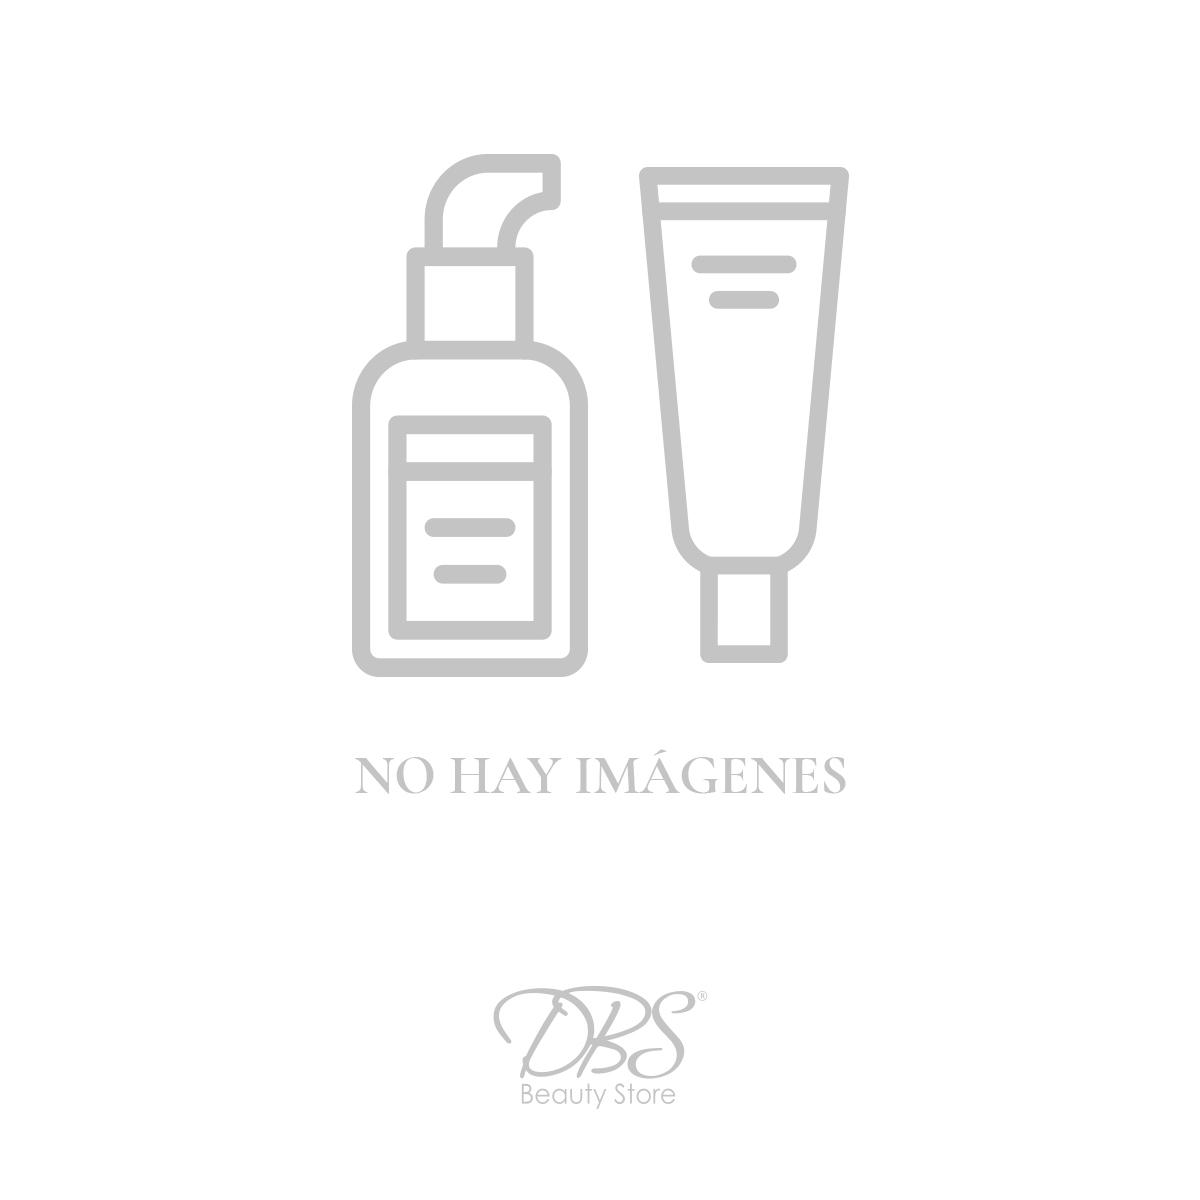 body-luxuries-BL-XC1945-MP.jpg